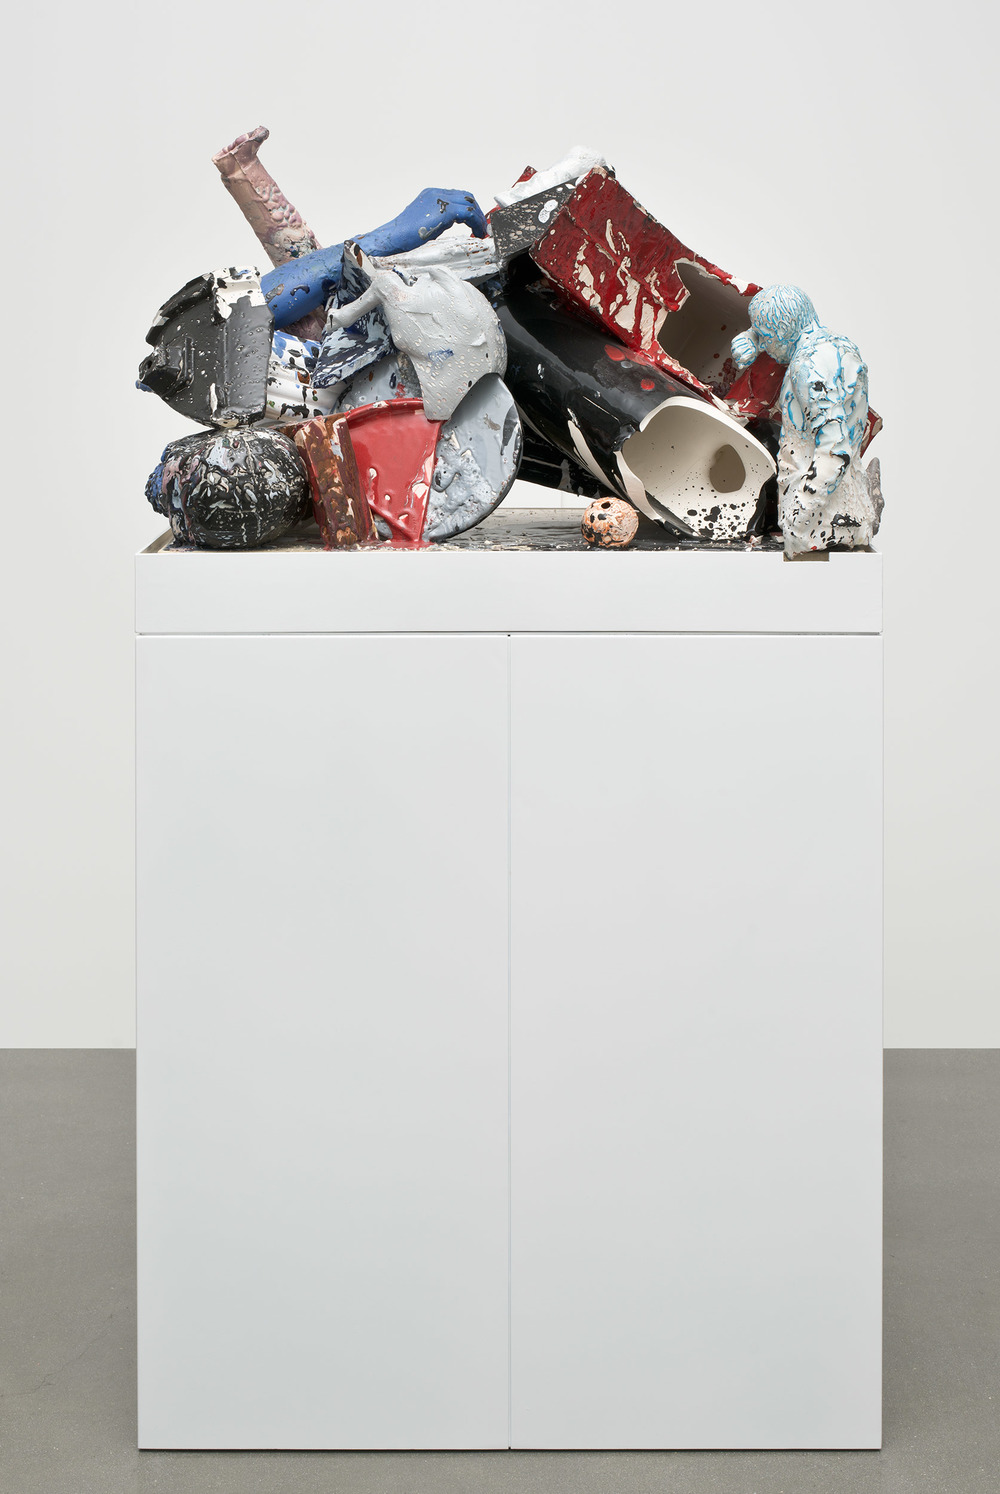 Aggregate XIX (August 20th–22nd, Cerámica Suro, Guadalajara, Jalisco, Mexico)    2013   Ceramica Suro slip cast remnants, glaze, and firing plate  38 x 20 1/2x 20 inches   Ceramics, 2013–